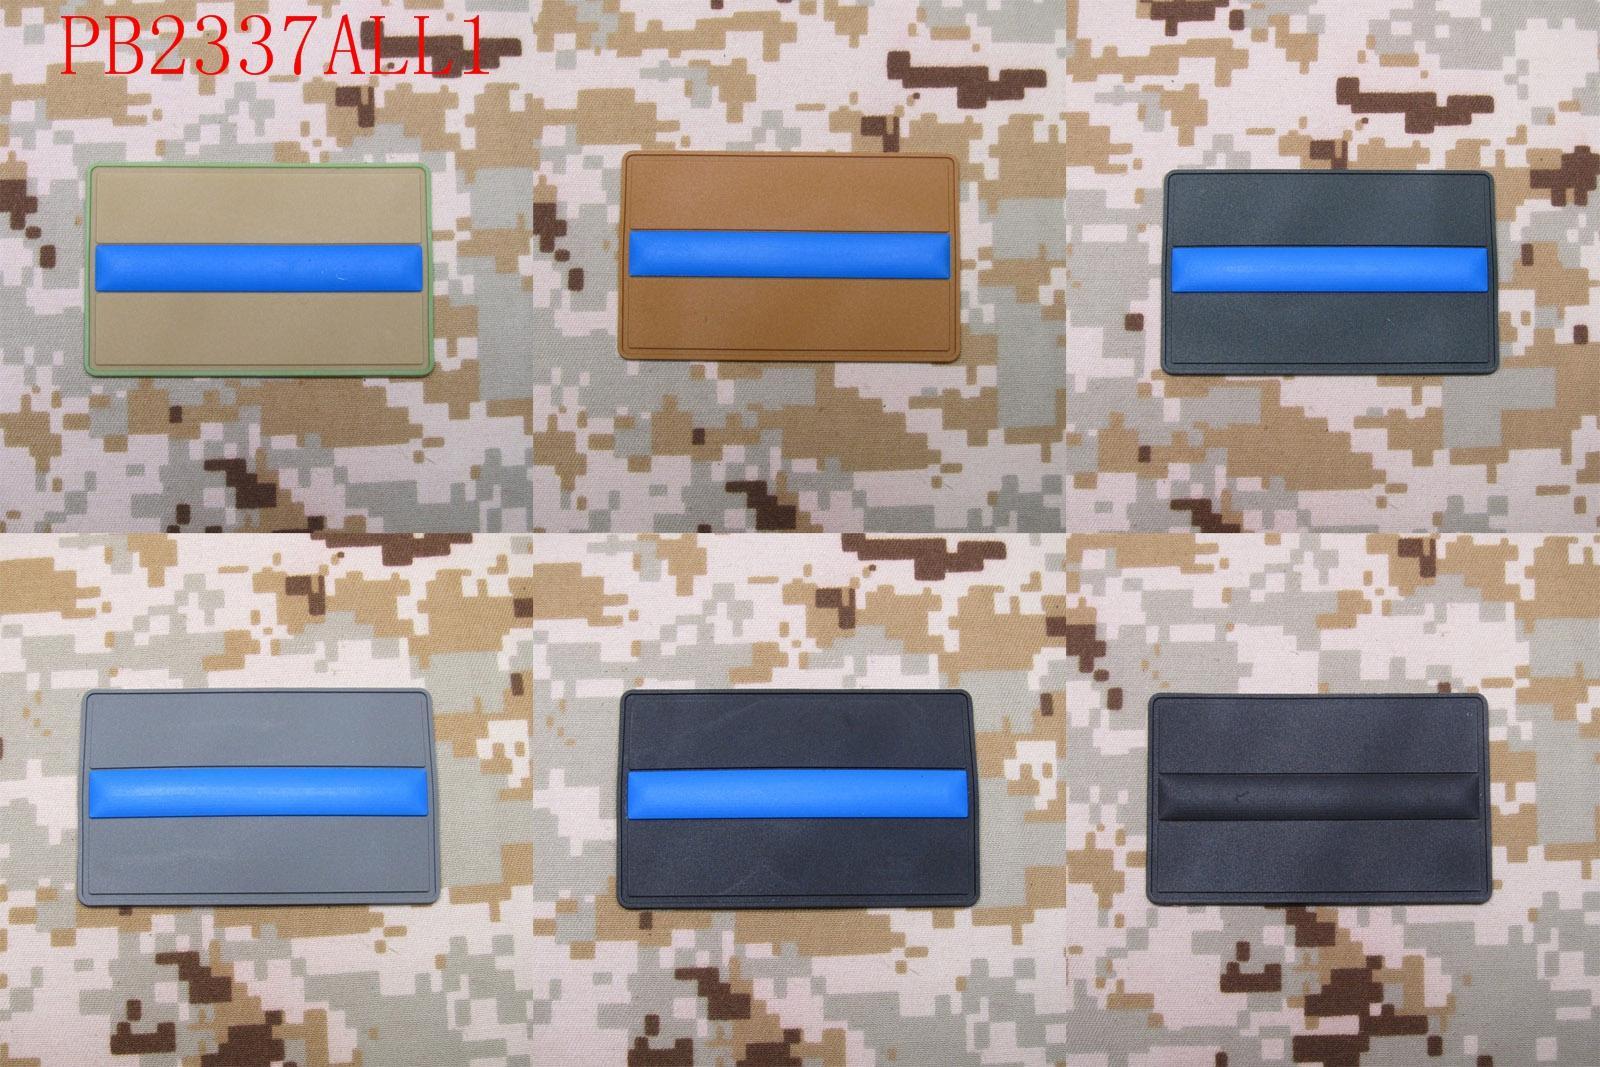 Pukulan Blue Blue Police SWAT 3D PVC patch